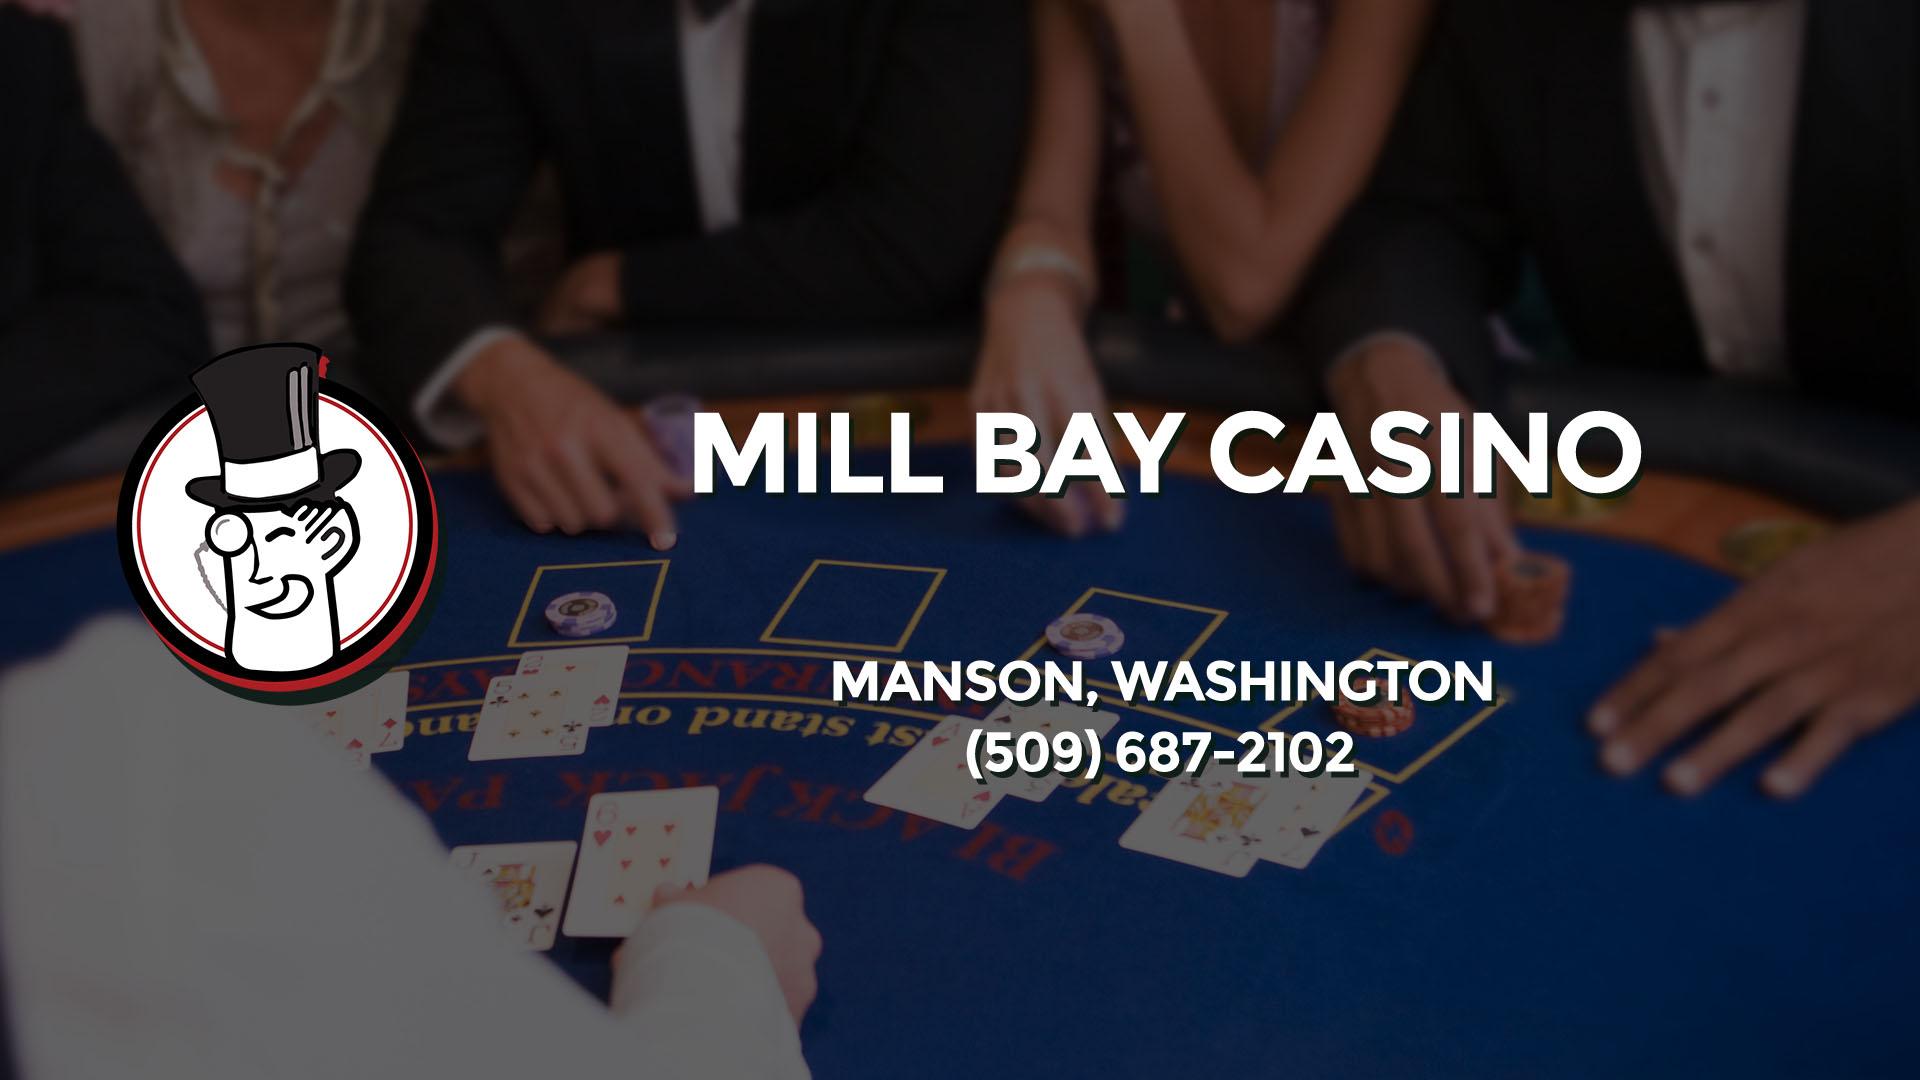 Mill Bay Casino Manson Wa Barons Bus